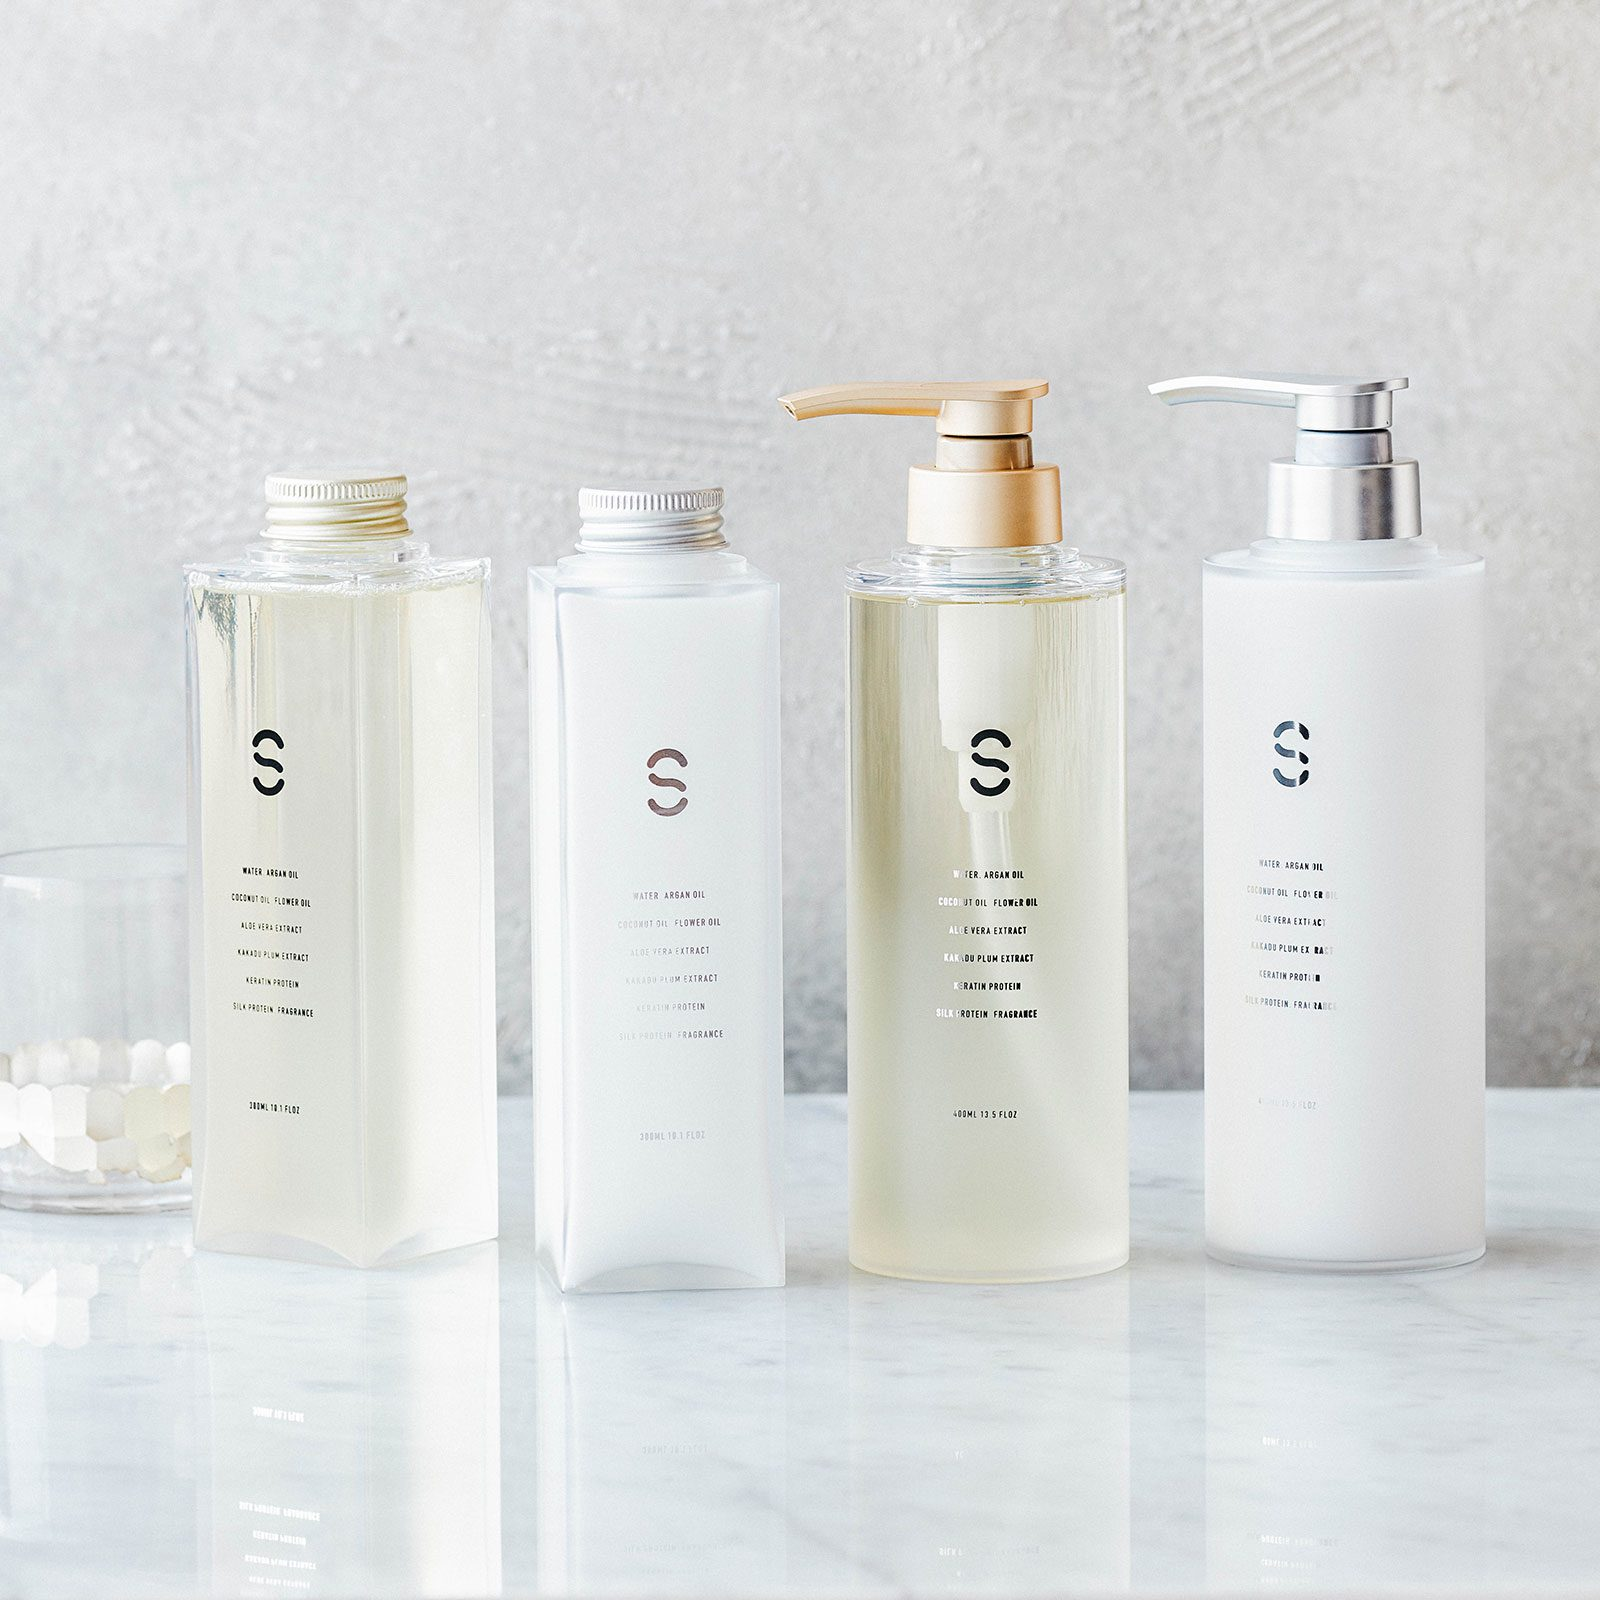 化粧品容器 (SOLIDE)